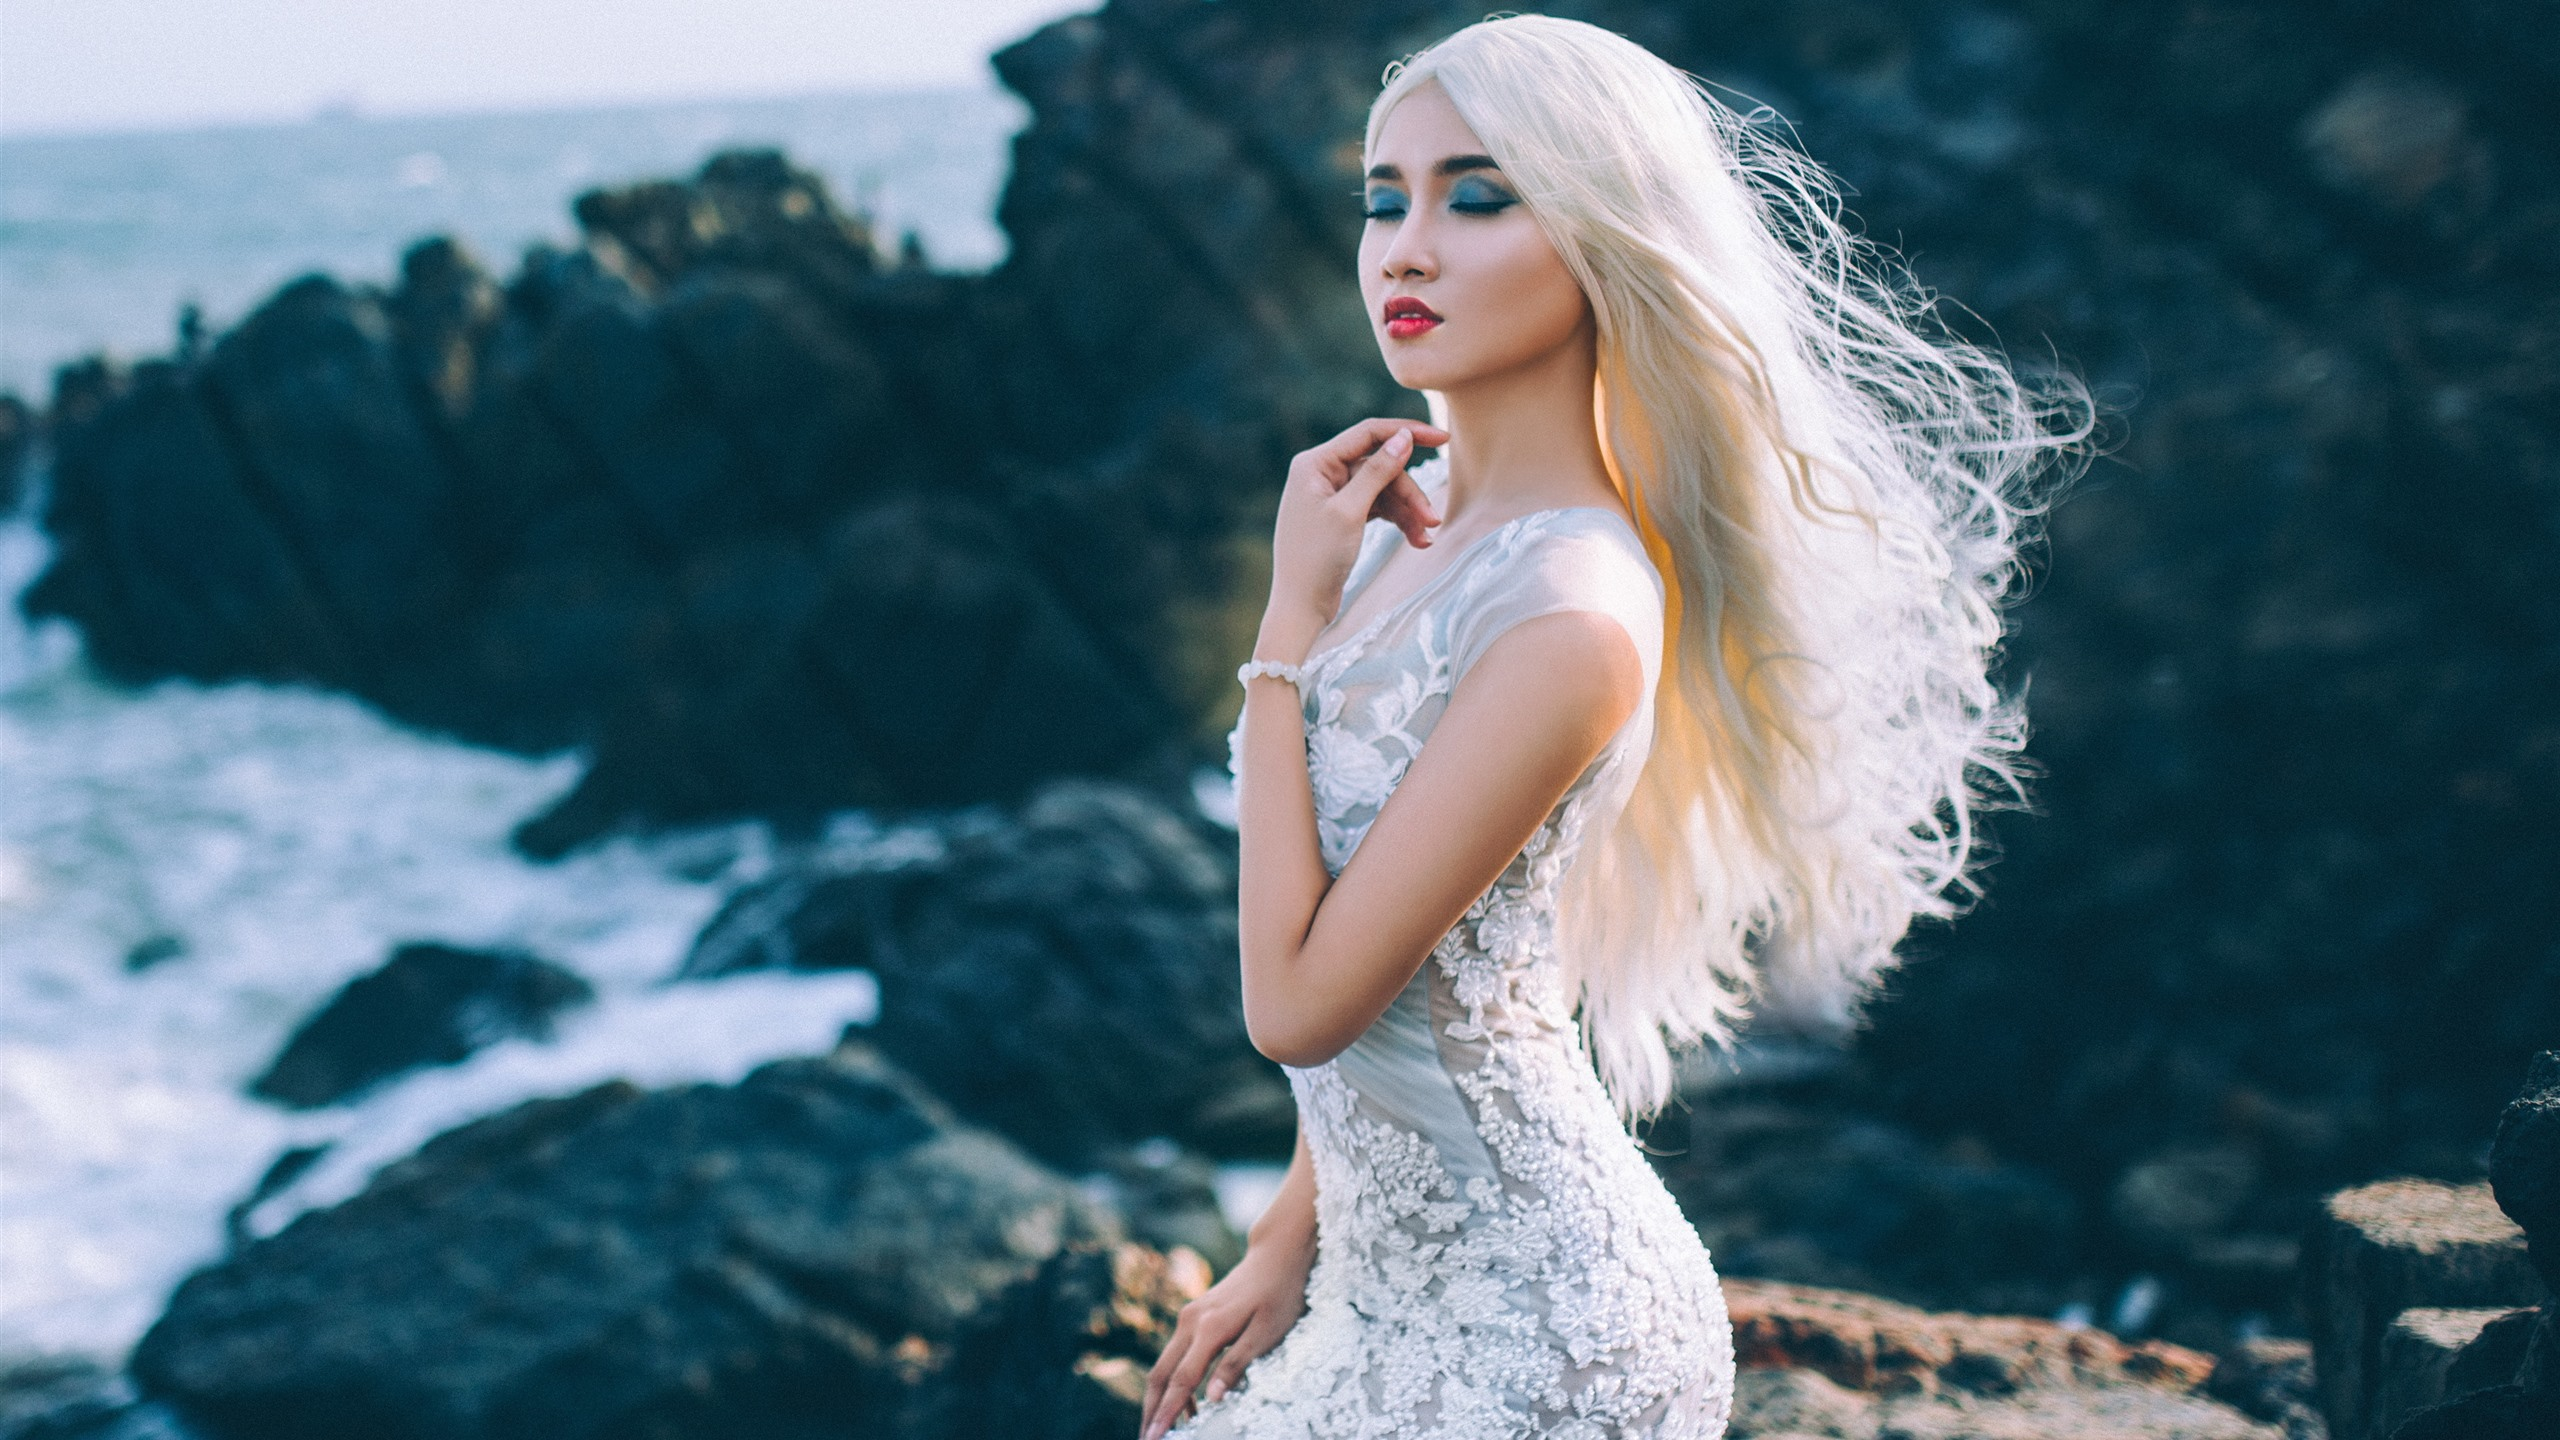 Blonde girl, fashion, black background 1242x2688 iPhone XS